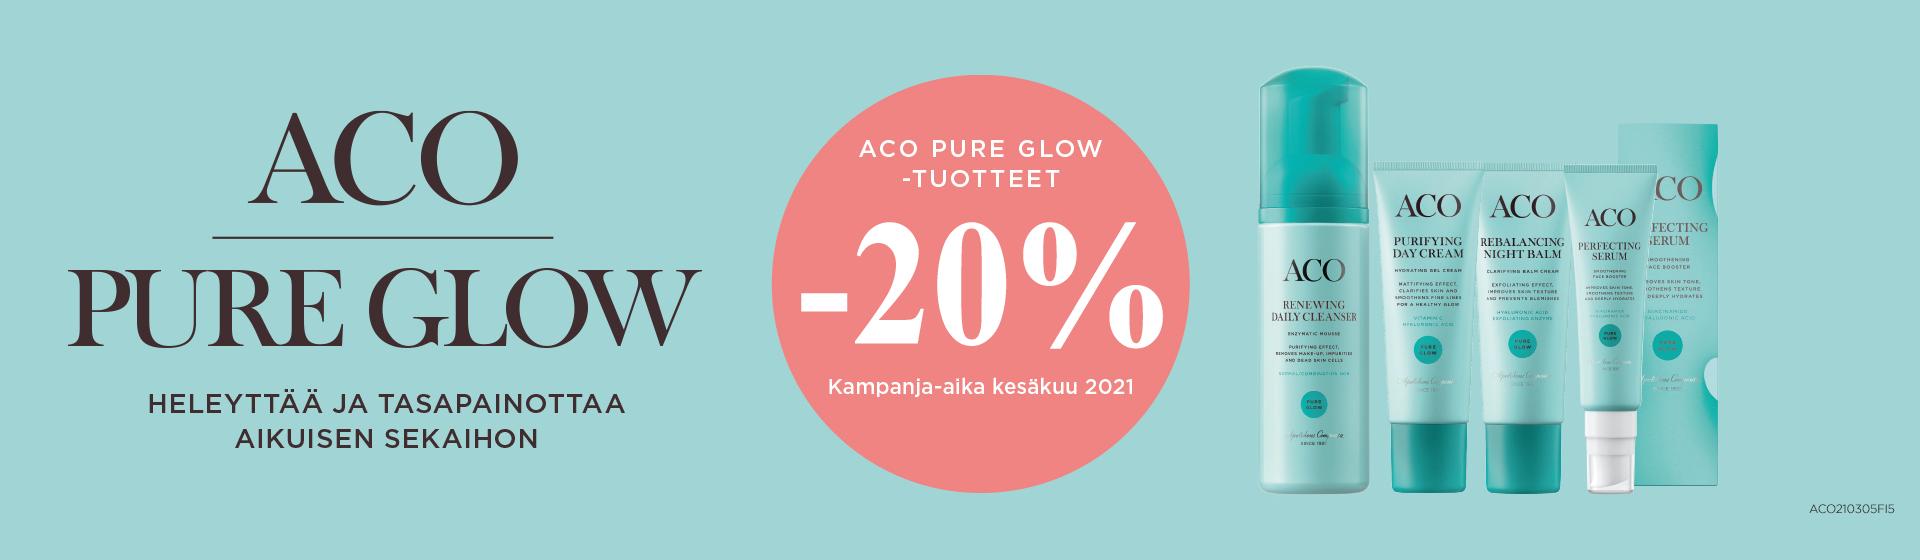 ACO Pure Glow -tuotteet -20%